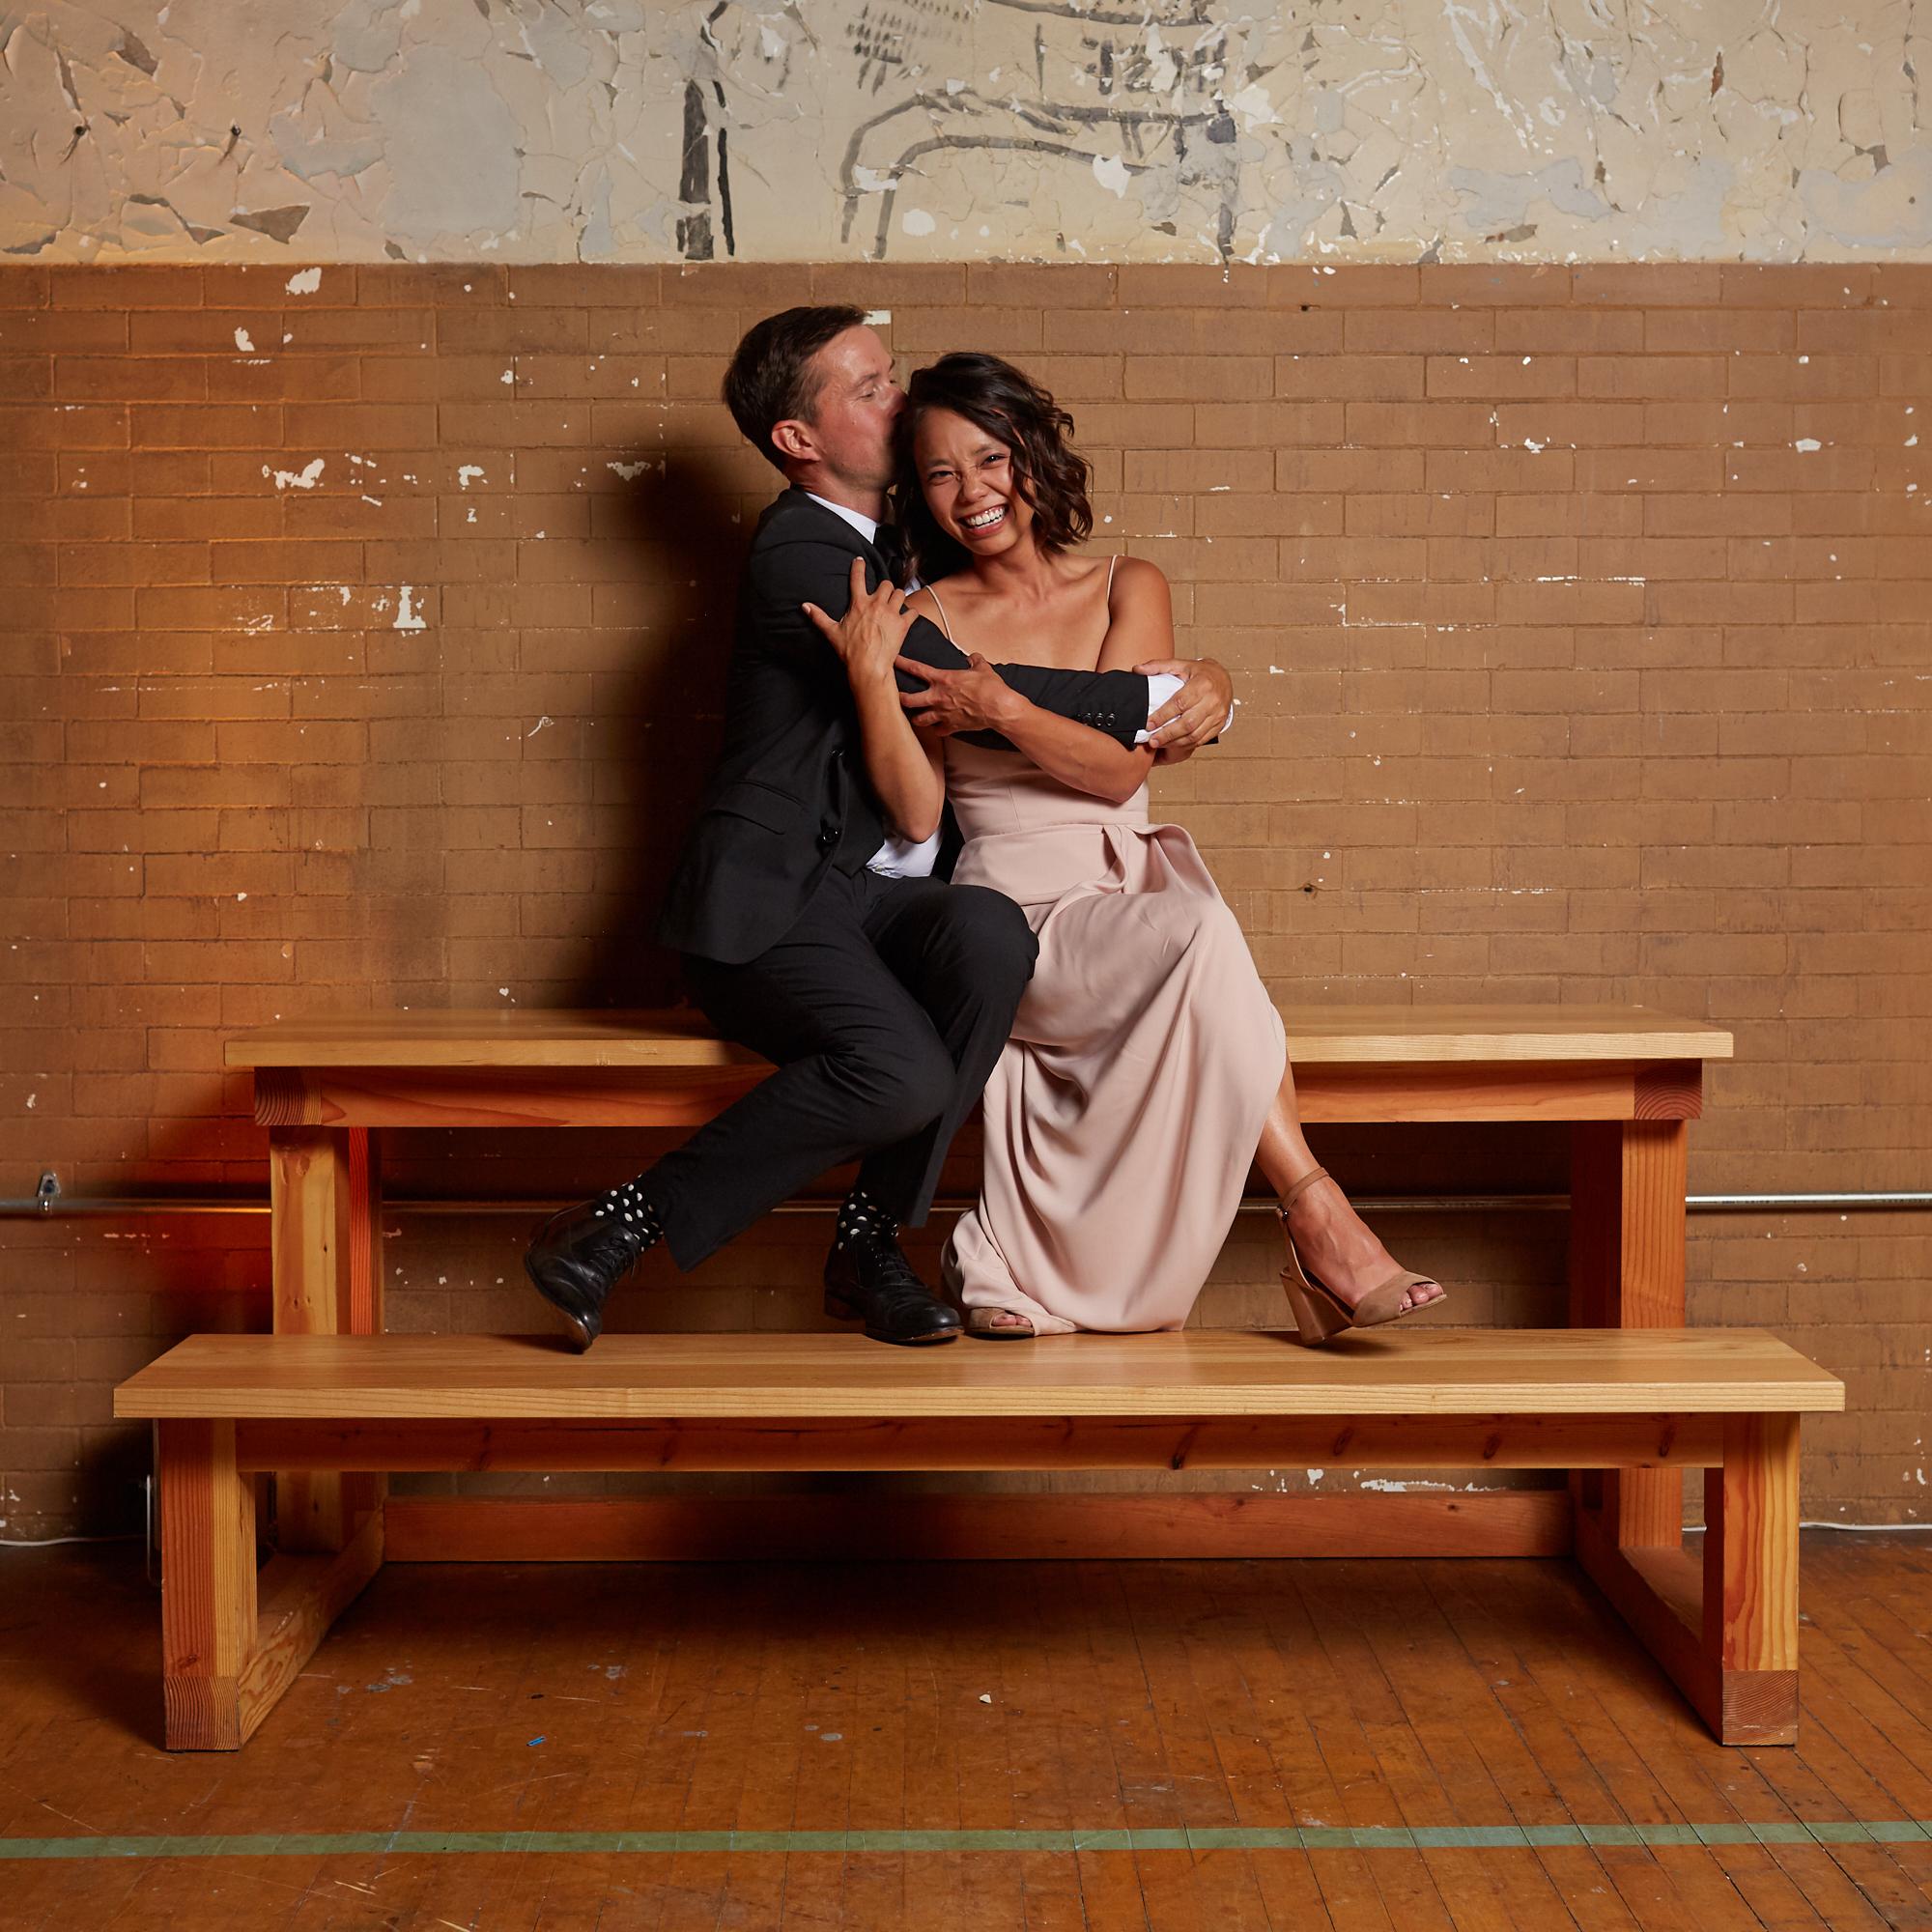 Ryan Hannah Sims - 2017.09 - Wedding Photos - 1026.jpg